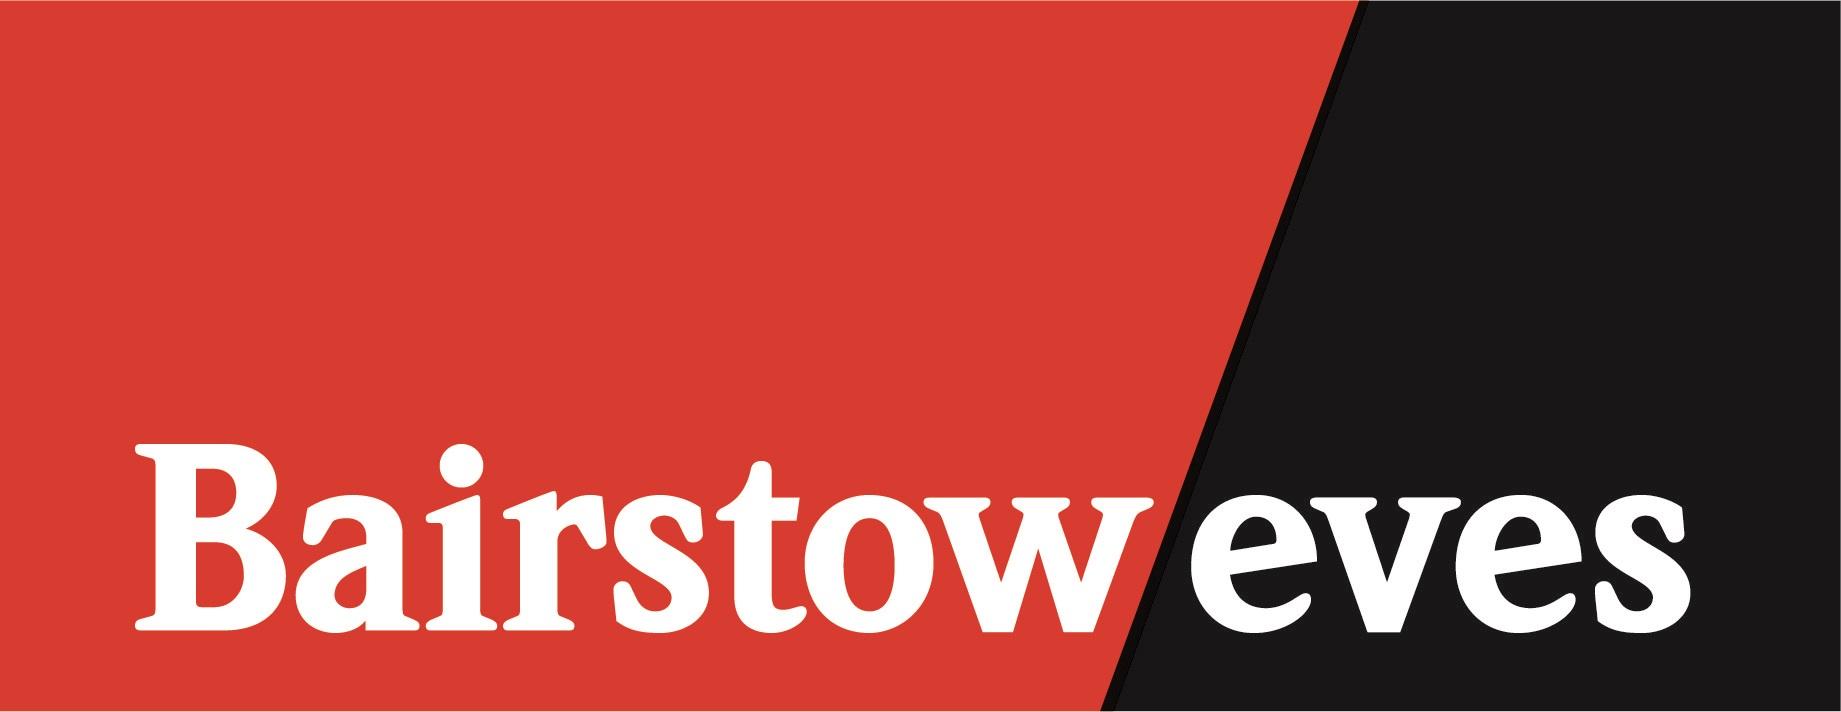 CW - Bairstow Eves - Radford